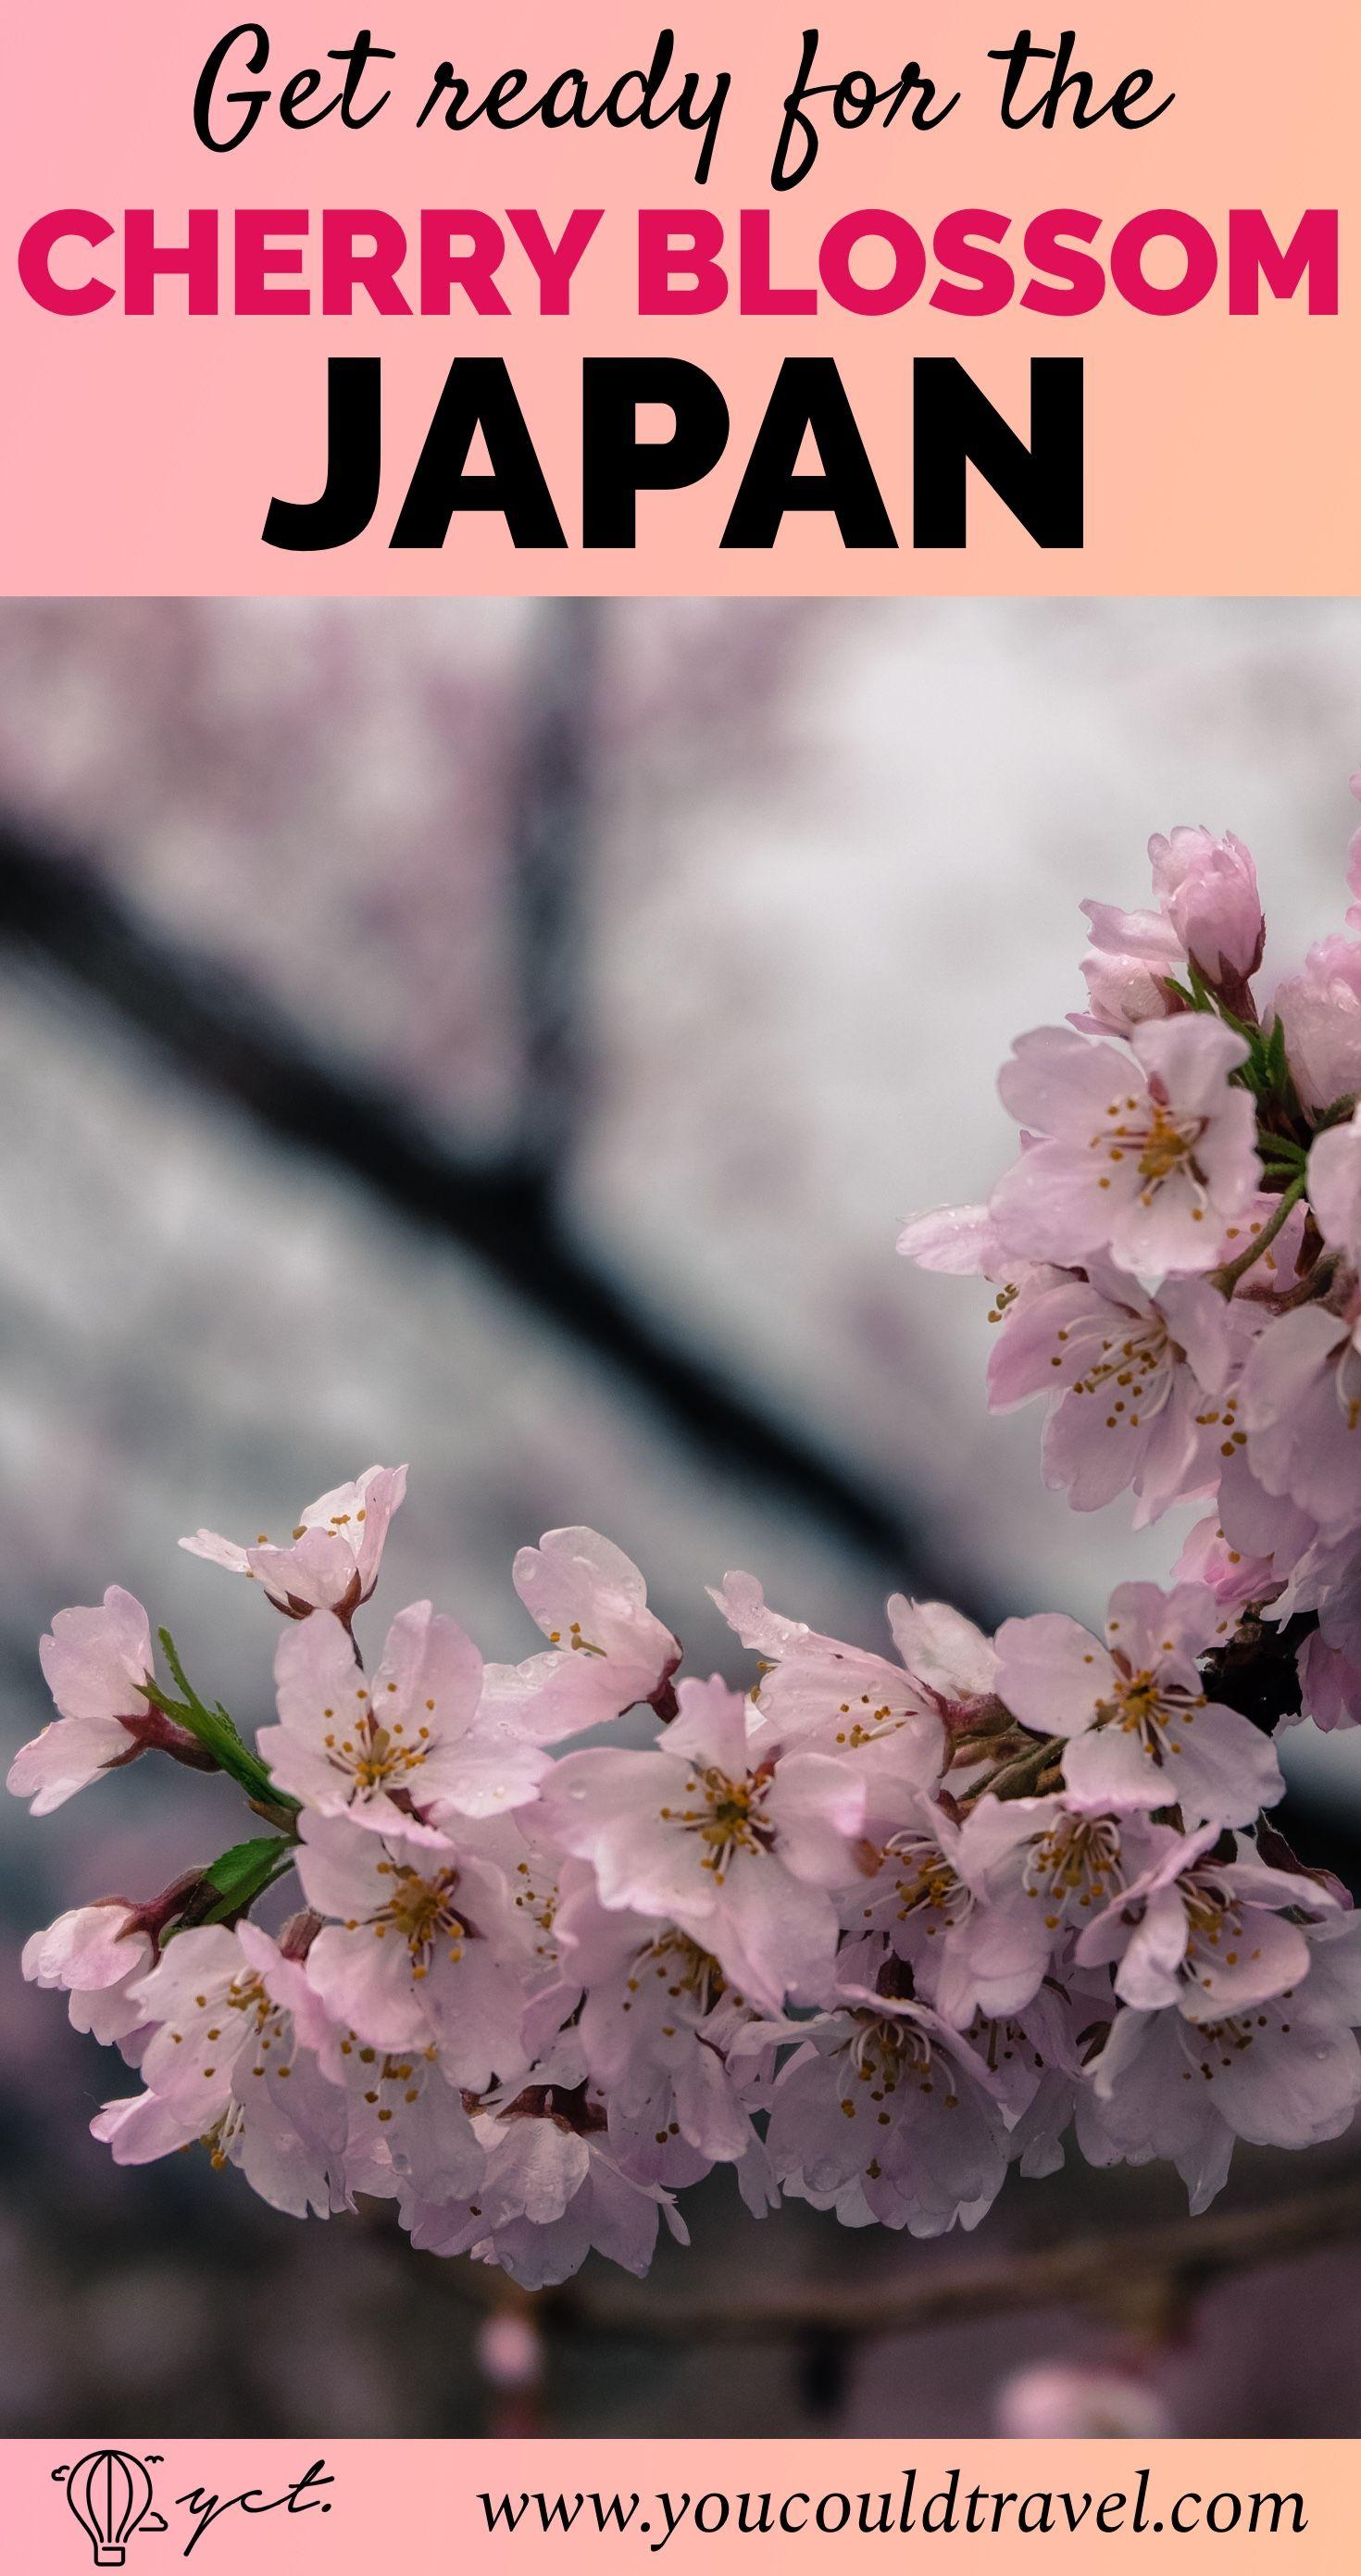 Japan 2020 Cherry Blossom Festival Updated Dates Japan Cherry Blossom Japan Cherry Blossom